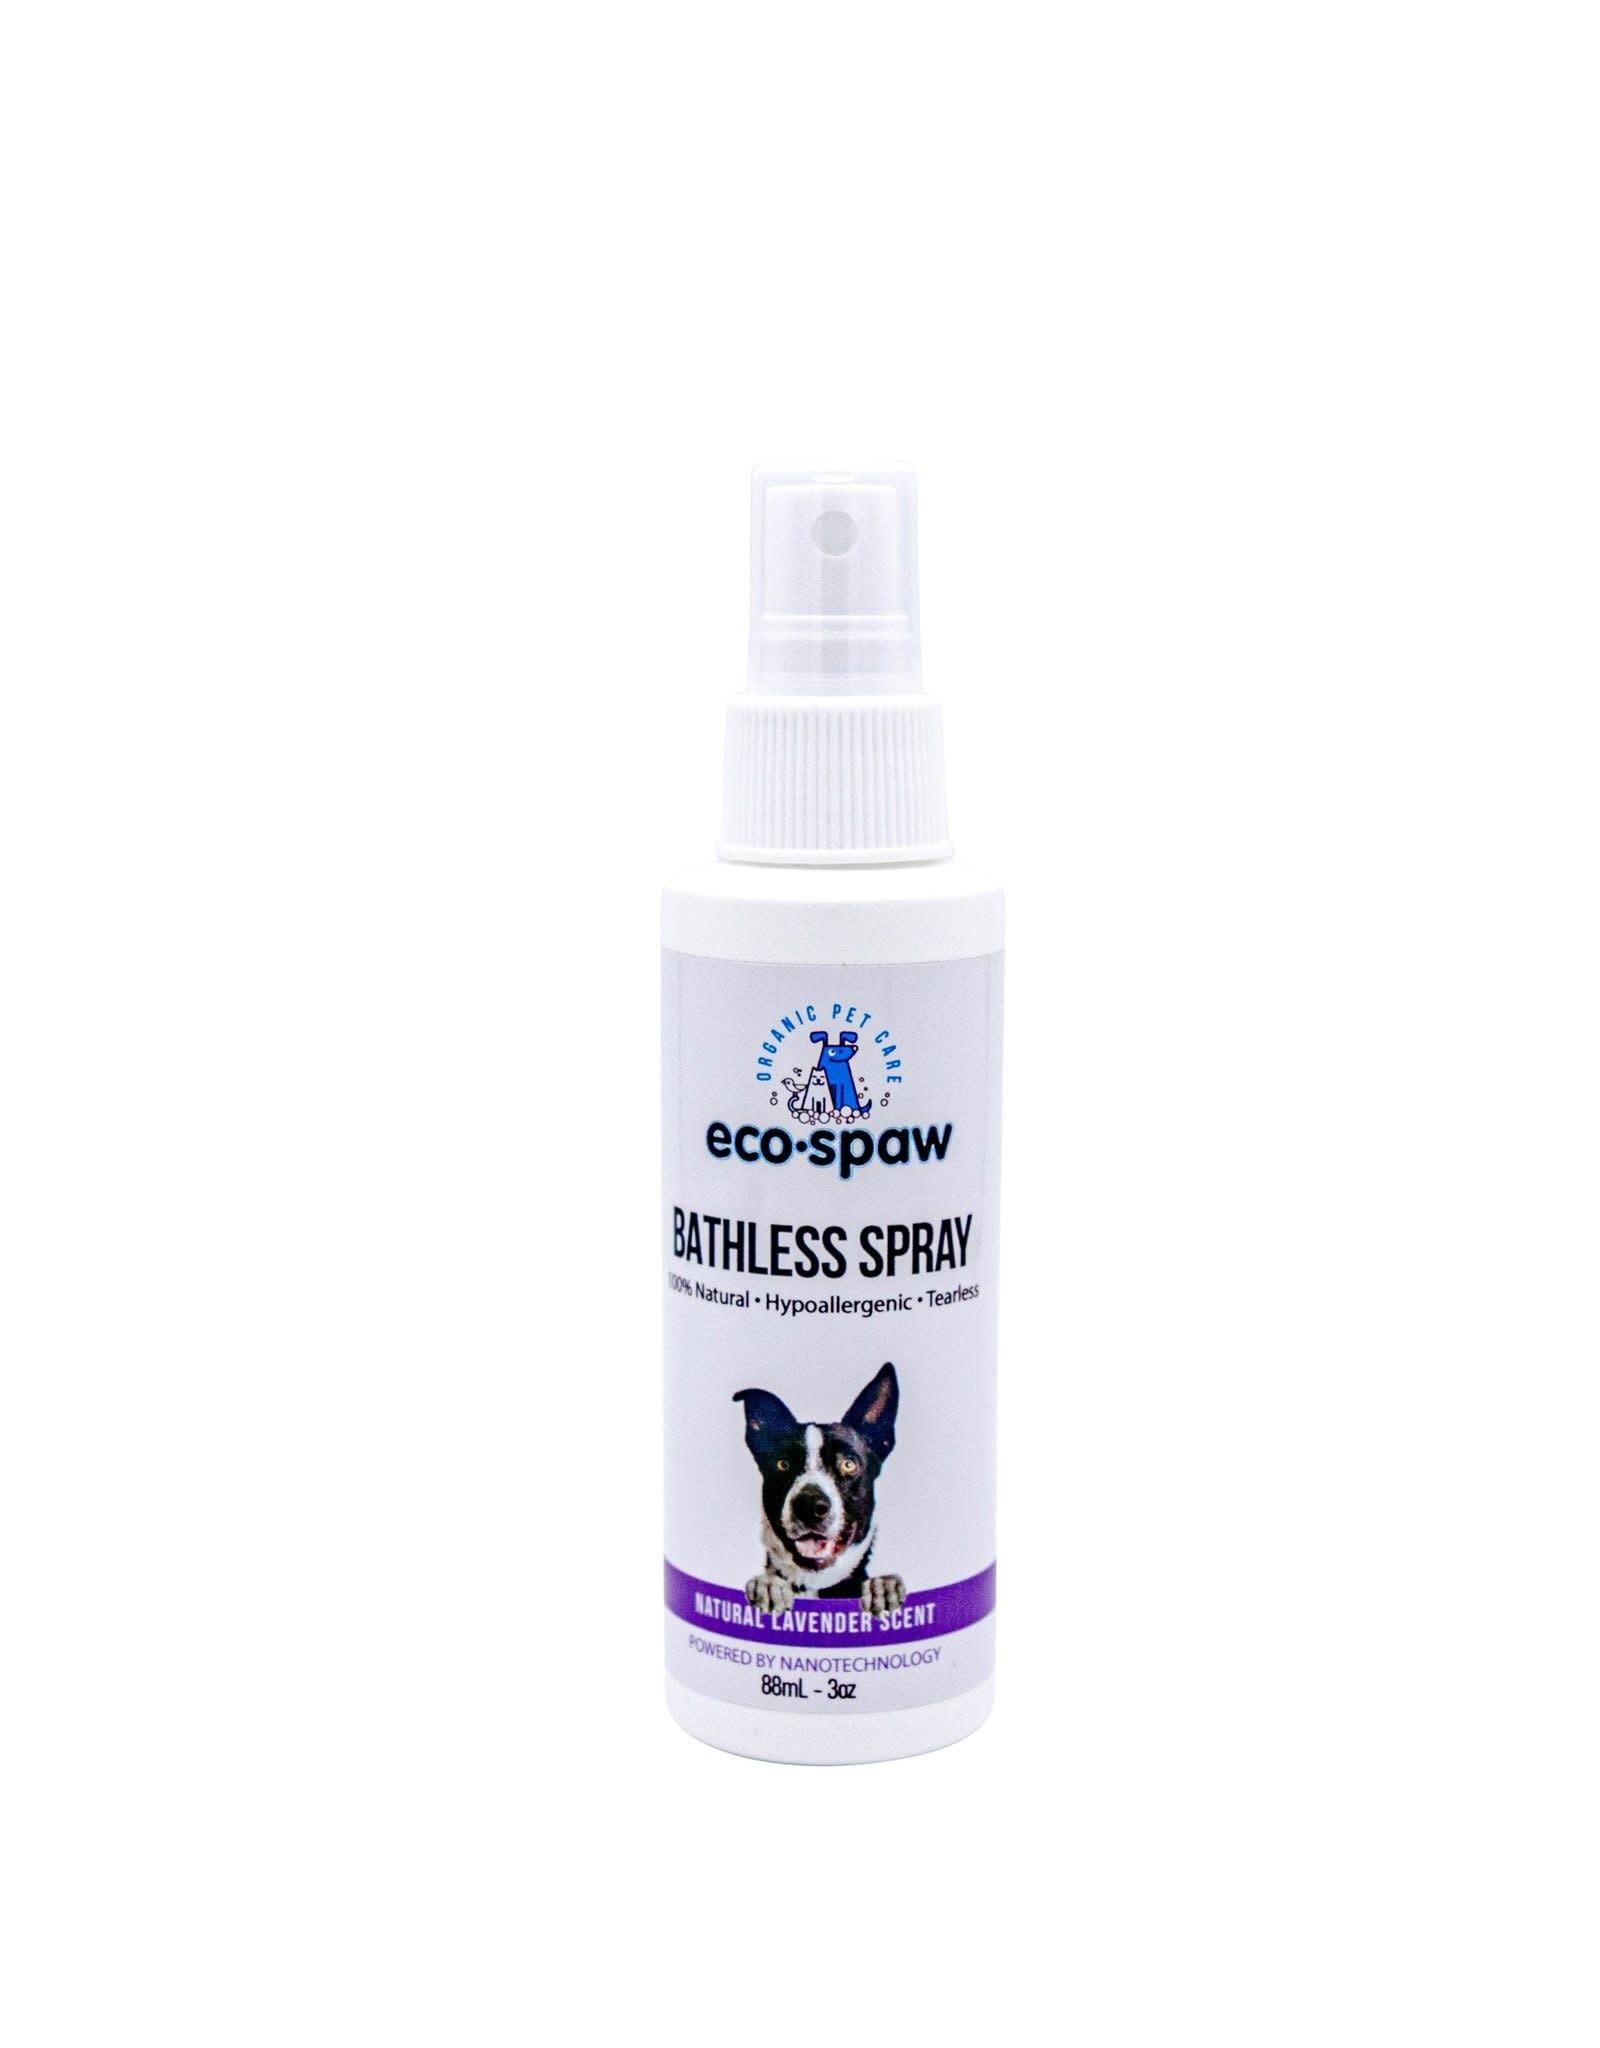 Eco Spaw EcoSpaw Bathless Spray Lavender 3 oz